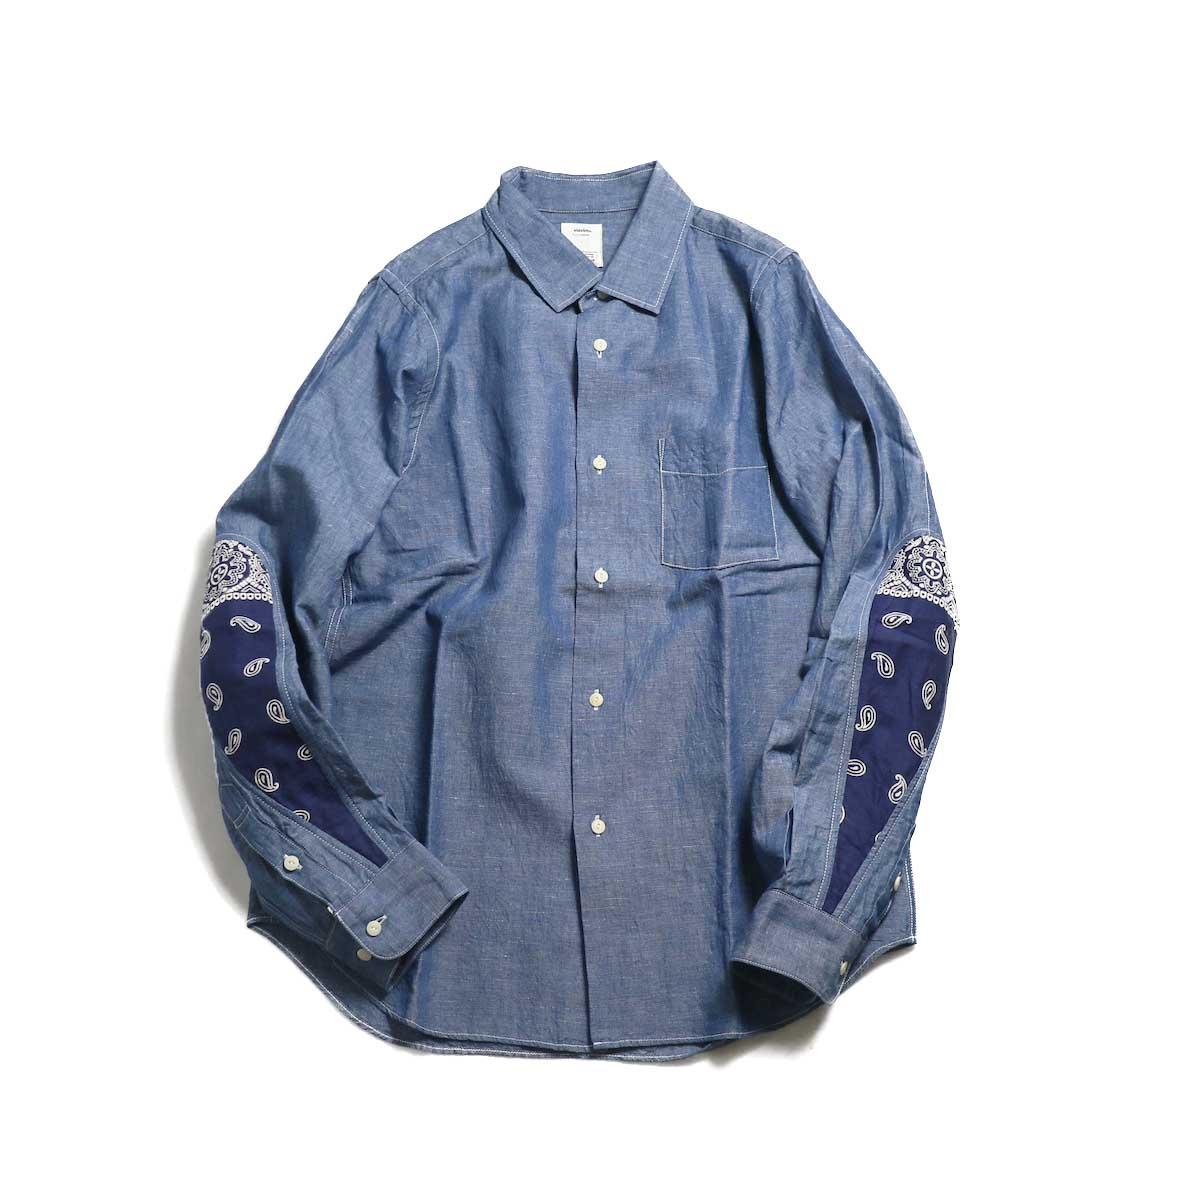 visvim / ALBACORE JUMBO SHIRT L/S (LUXSIC) -Blue